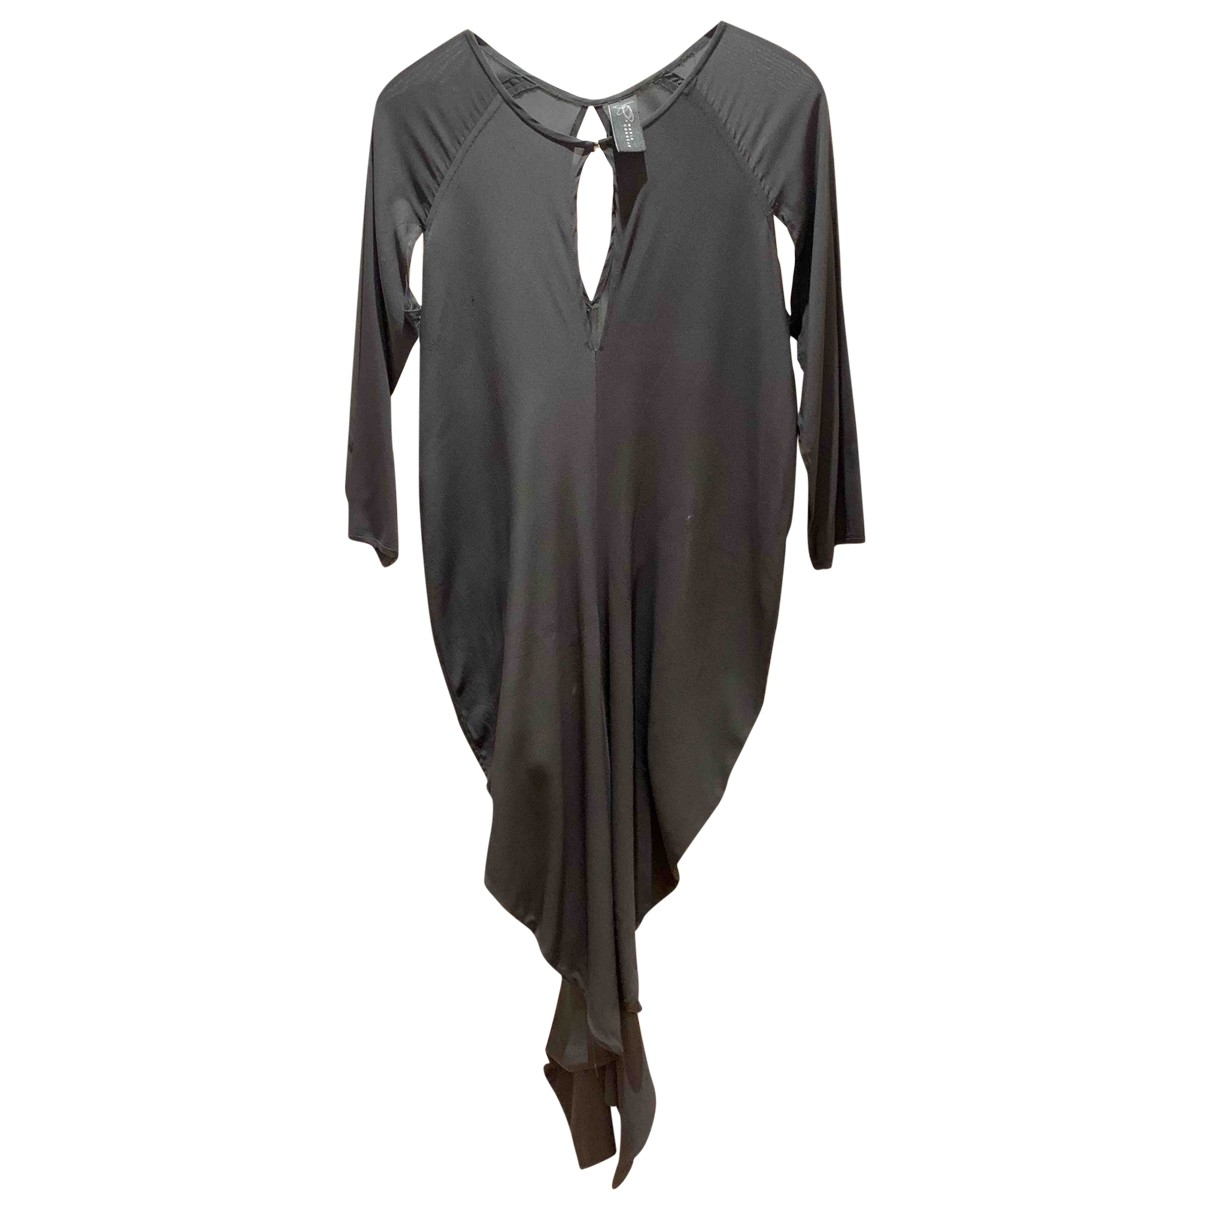 Zero+maria Cornejo \N Kleid in  Schwarz Baumwolle - Elasthan